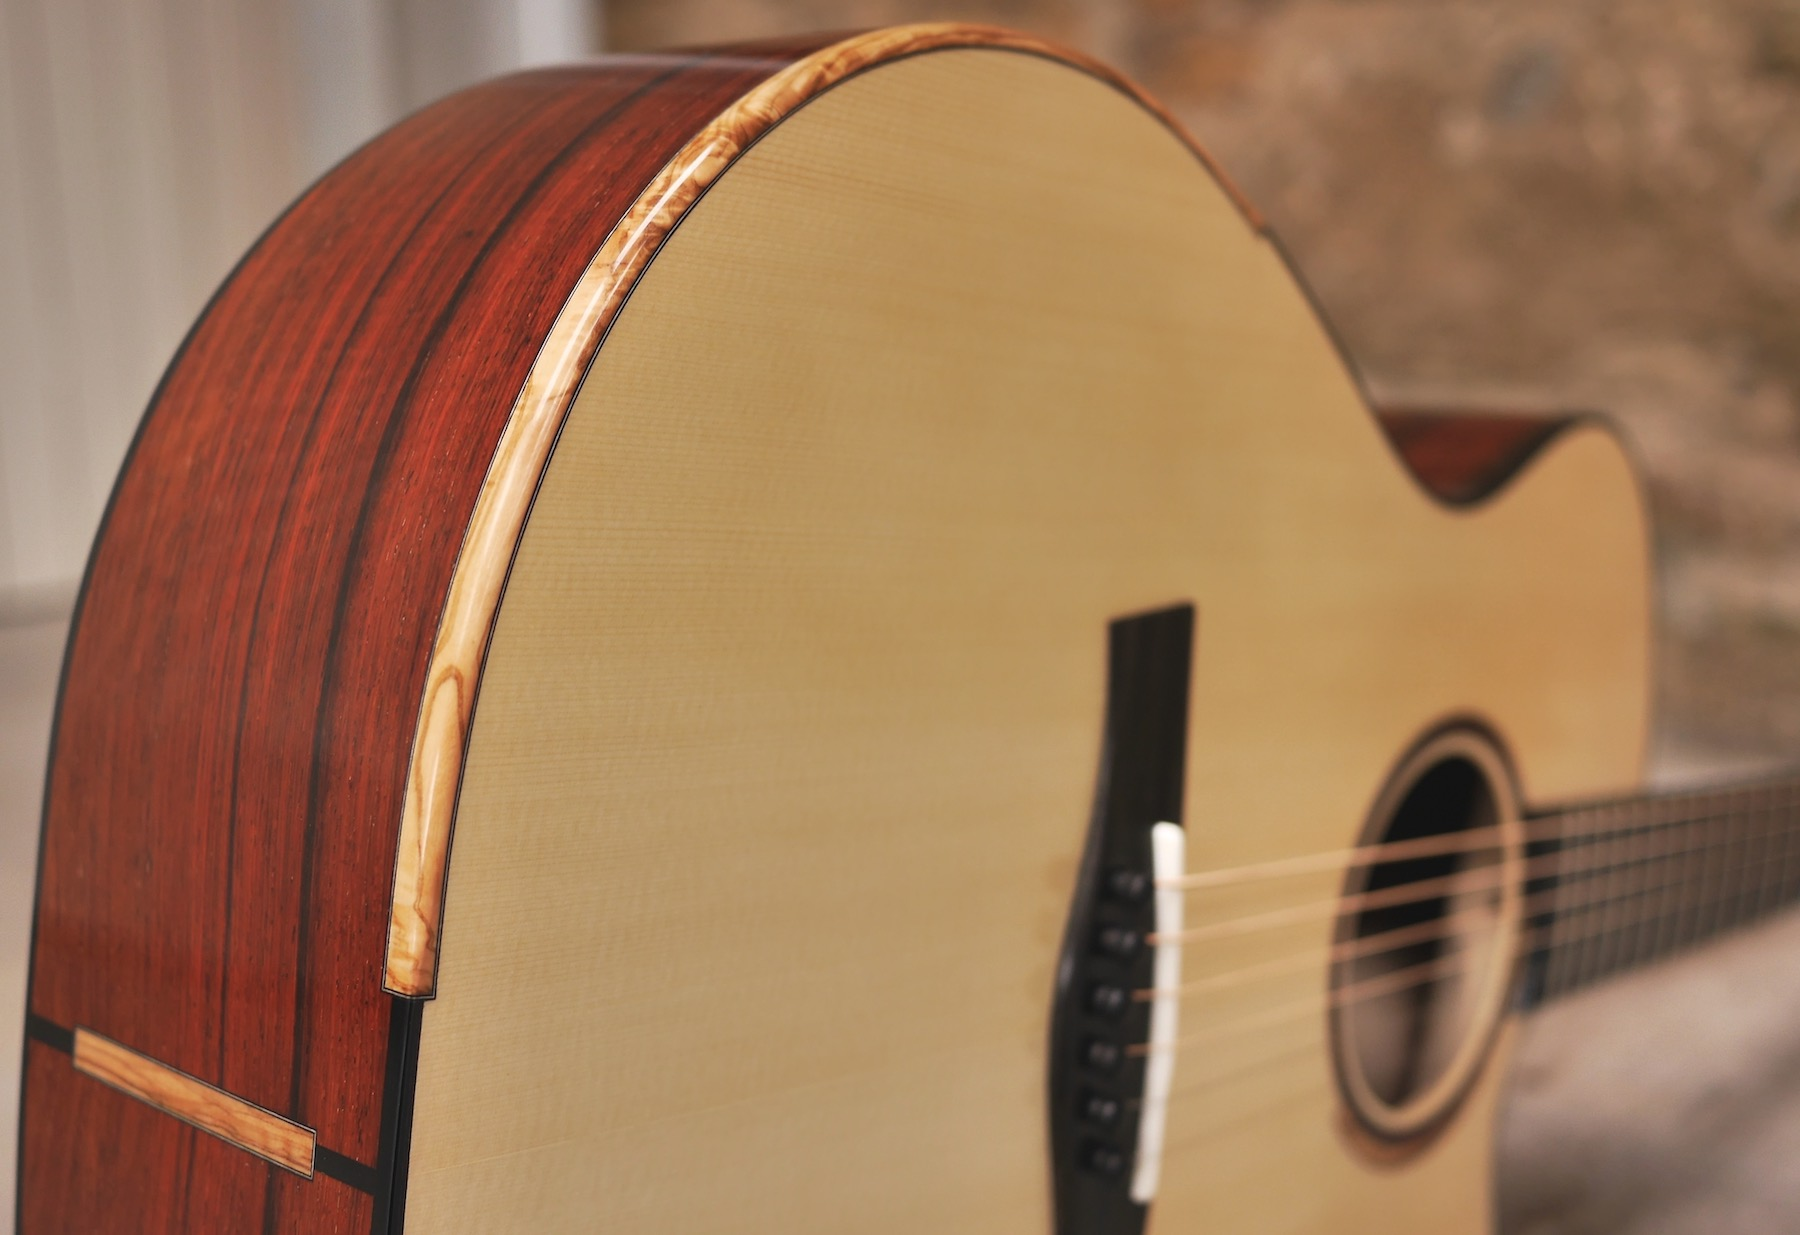 Olive Wood Micro Bevel on Rod's Taran